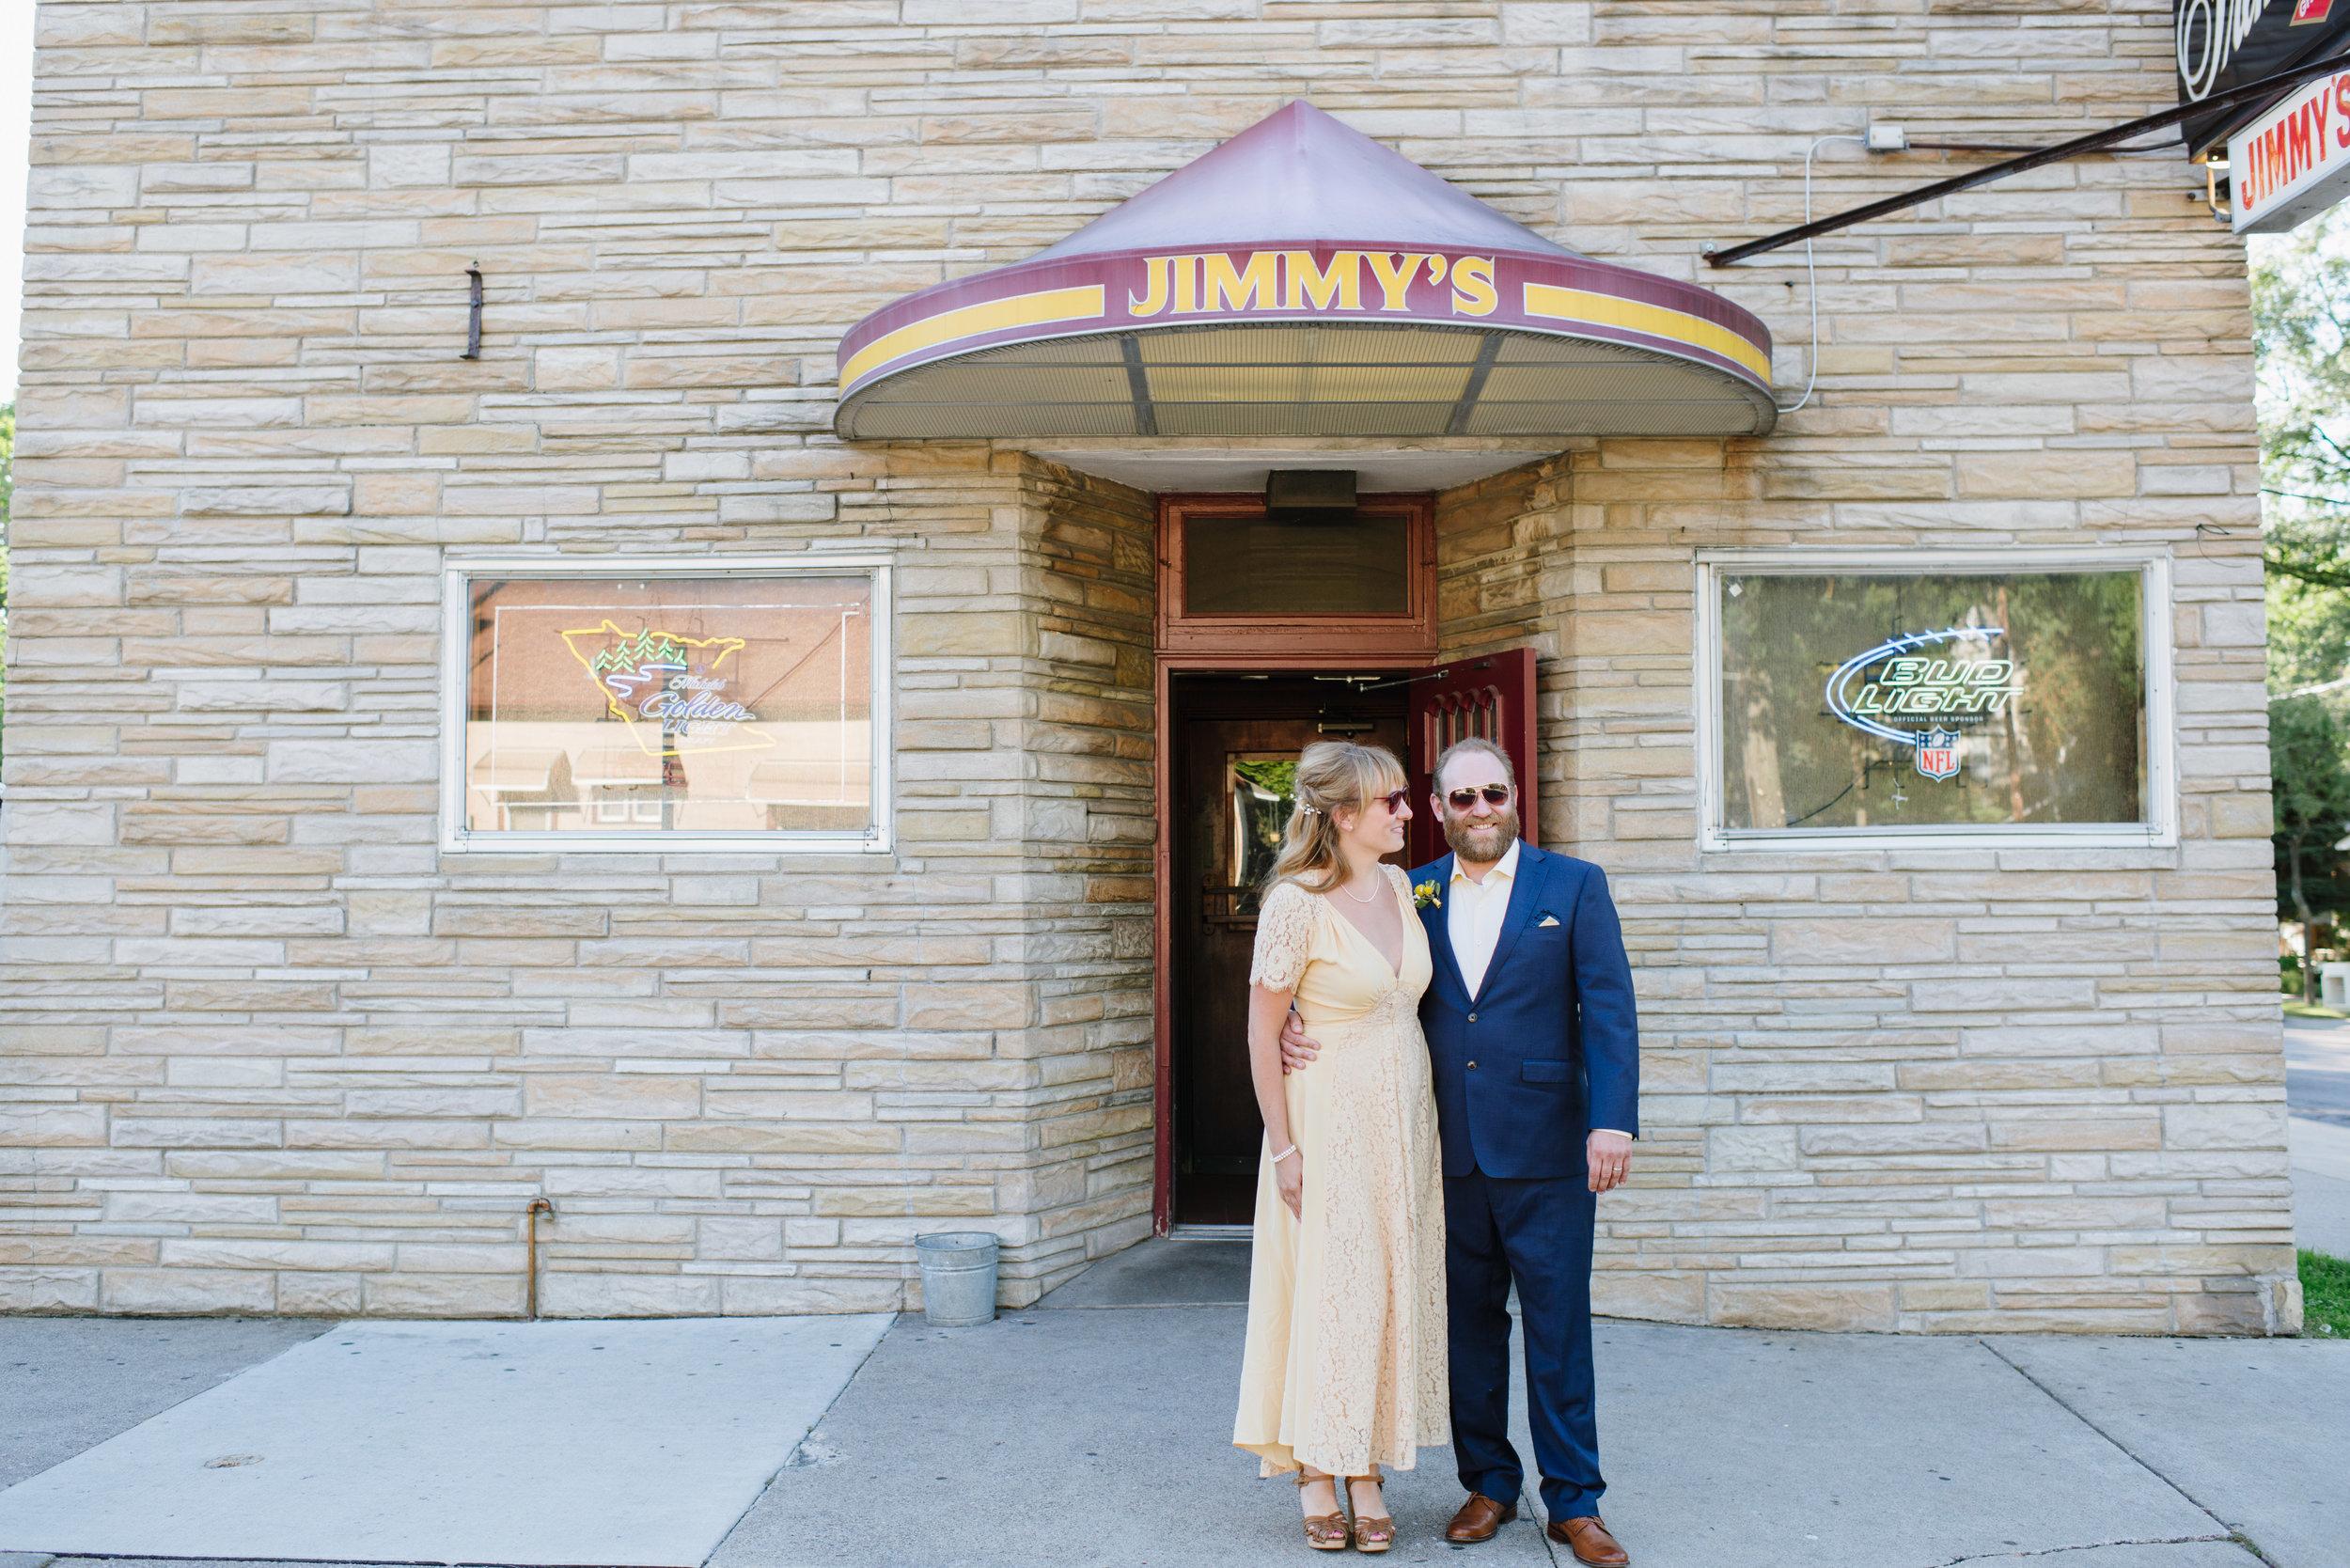 Jimmys-123.jpg